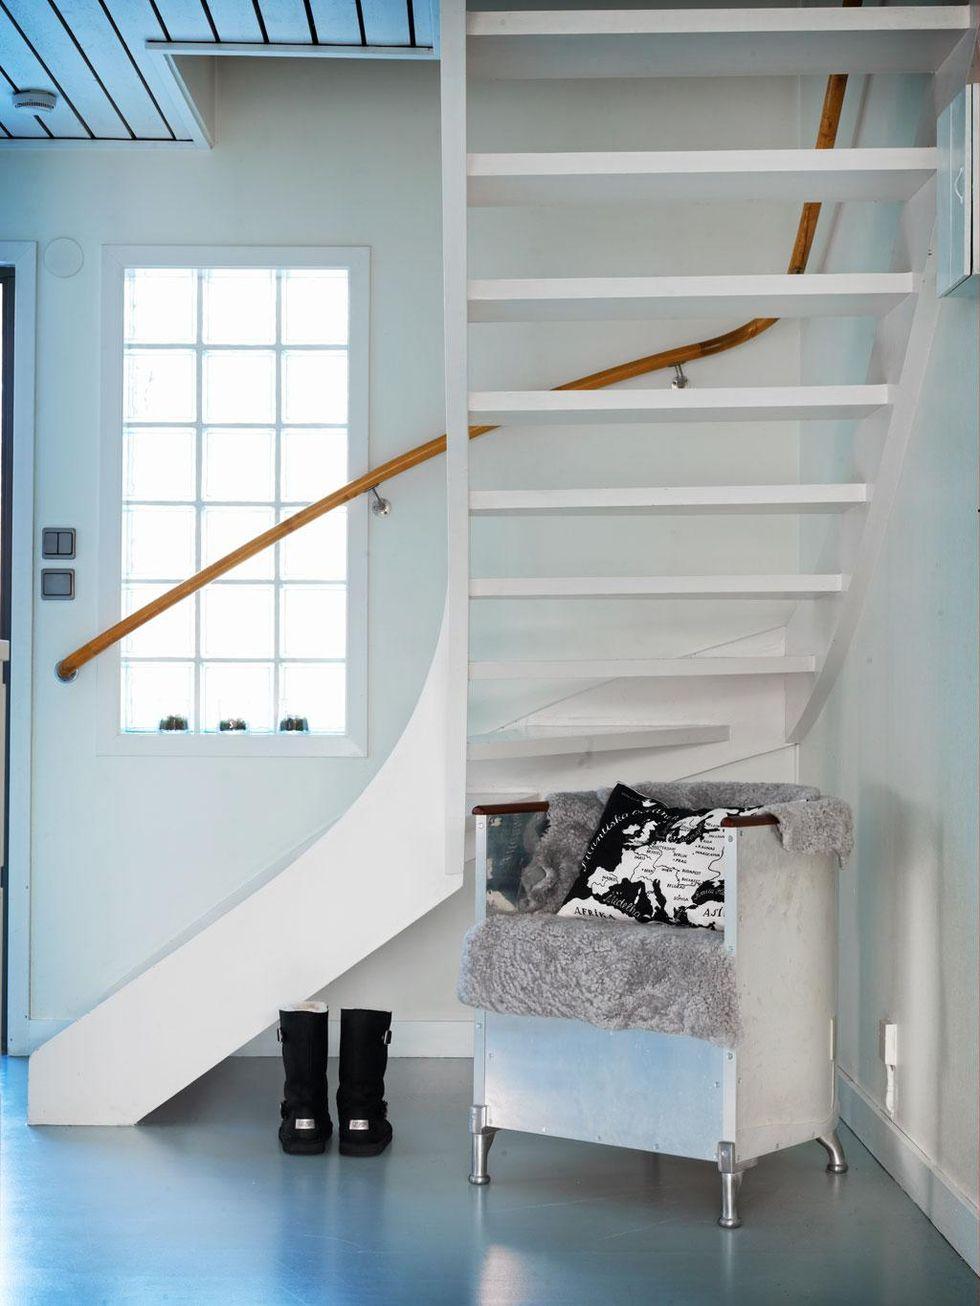 MÃ¥la om trappan – hus & hem